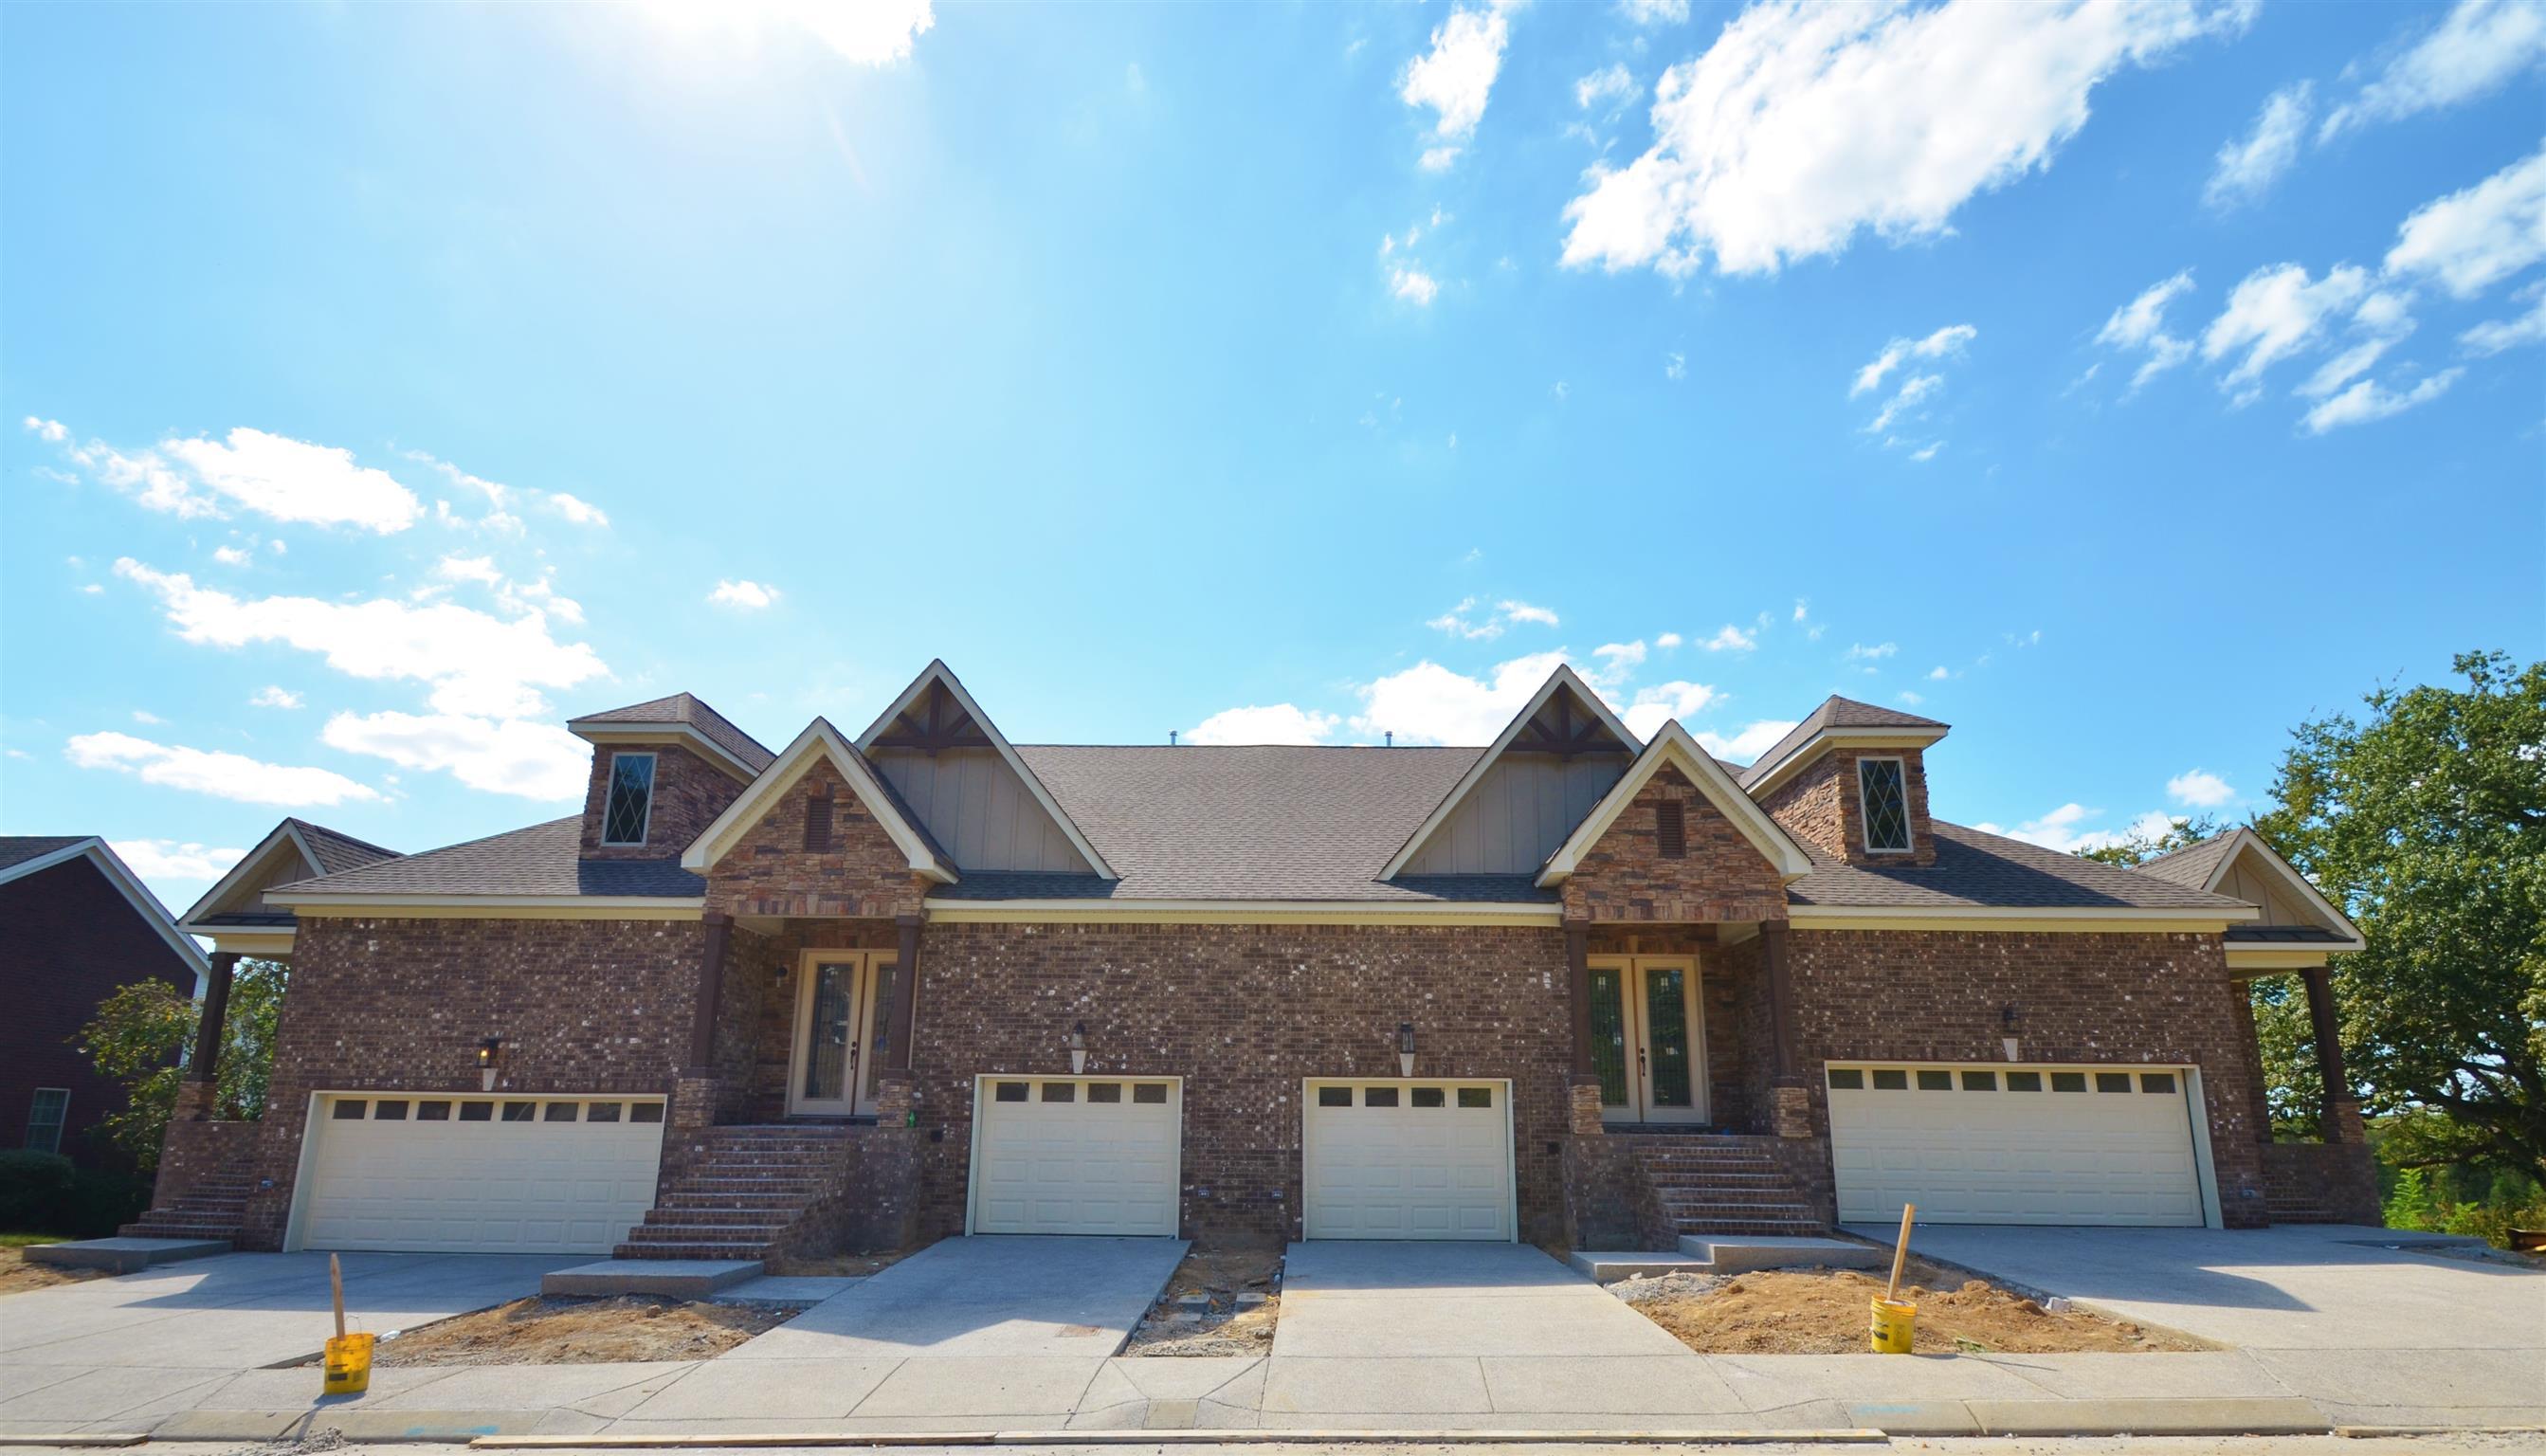 5004 Southfork Blvd #21, Old Hickory, TN 37138 - Old Hickory, TN real estate listing